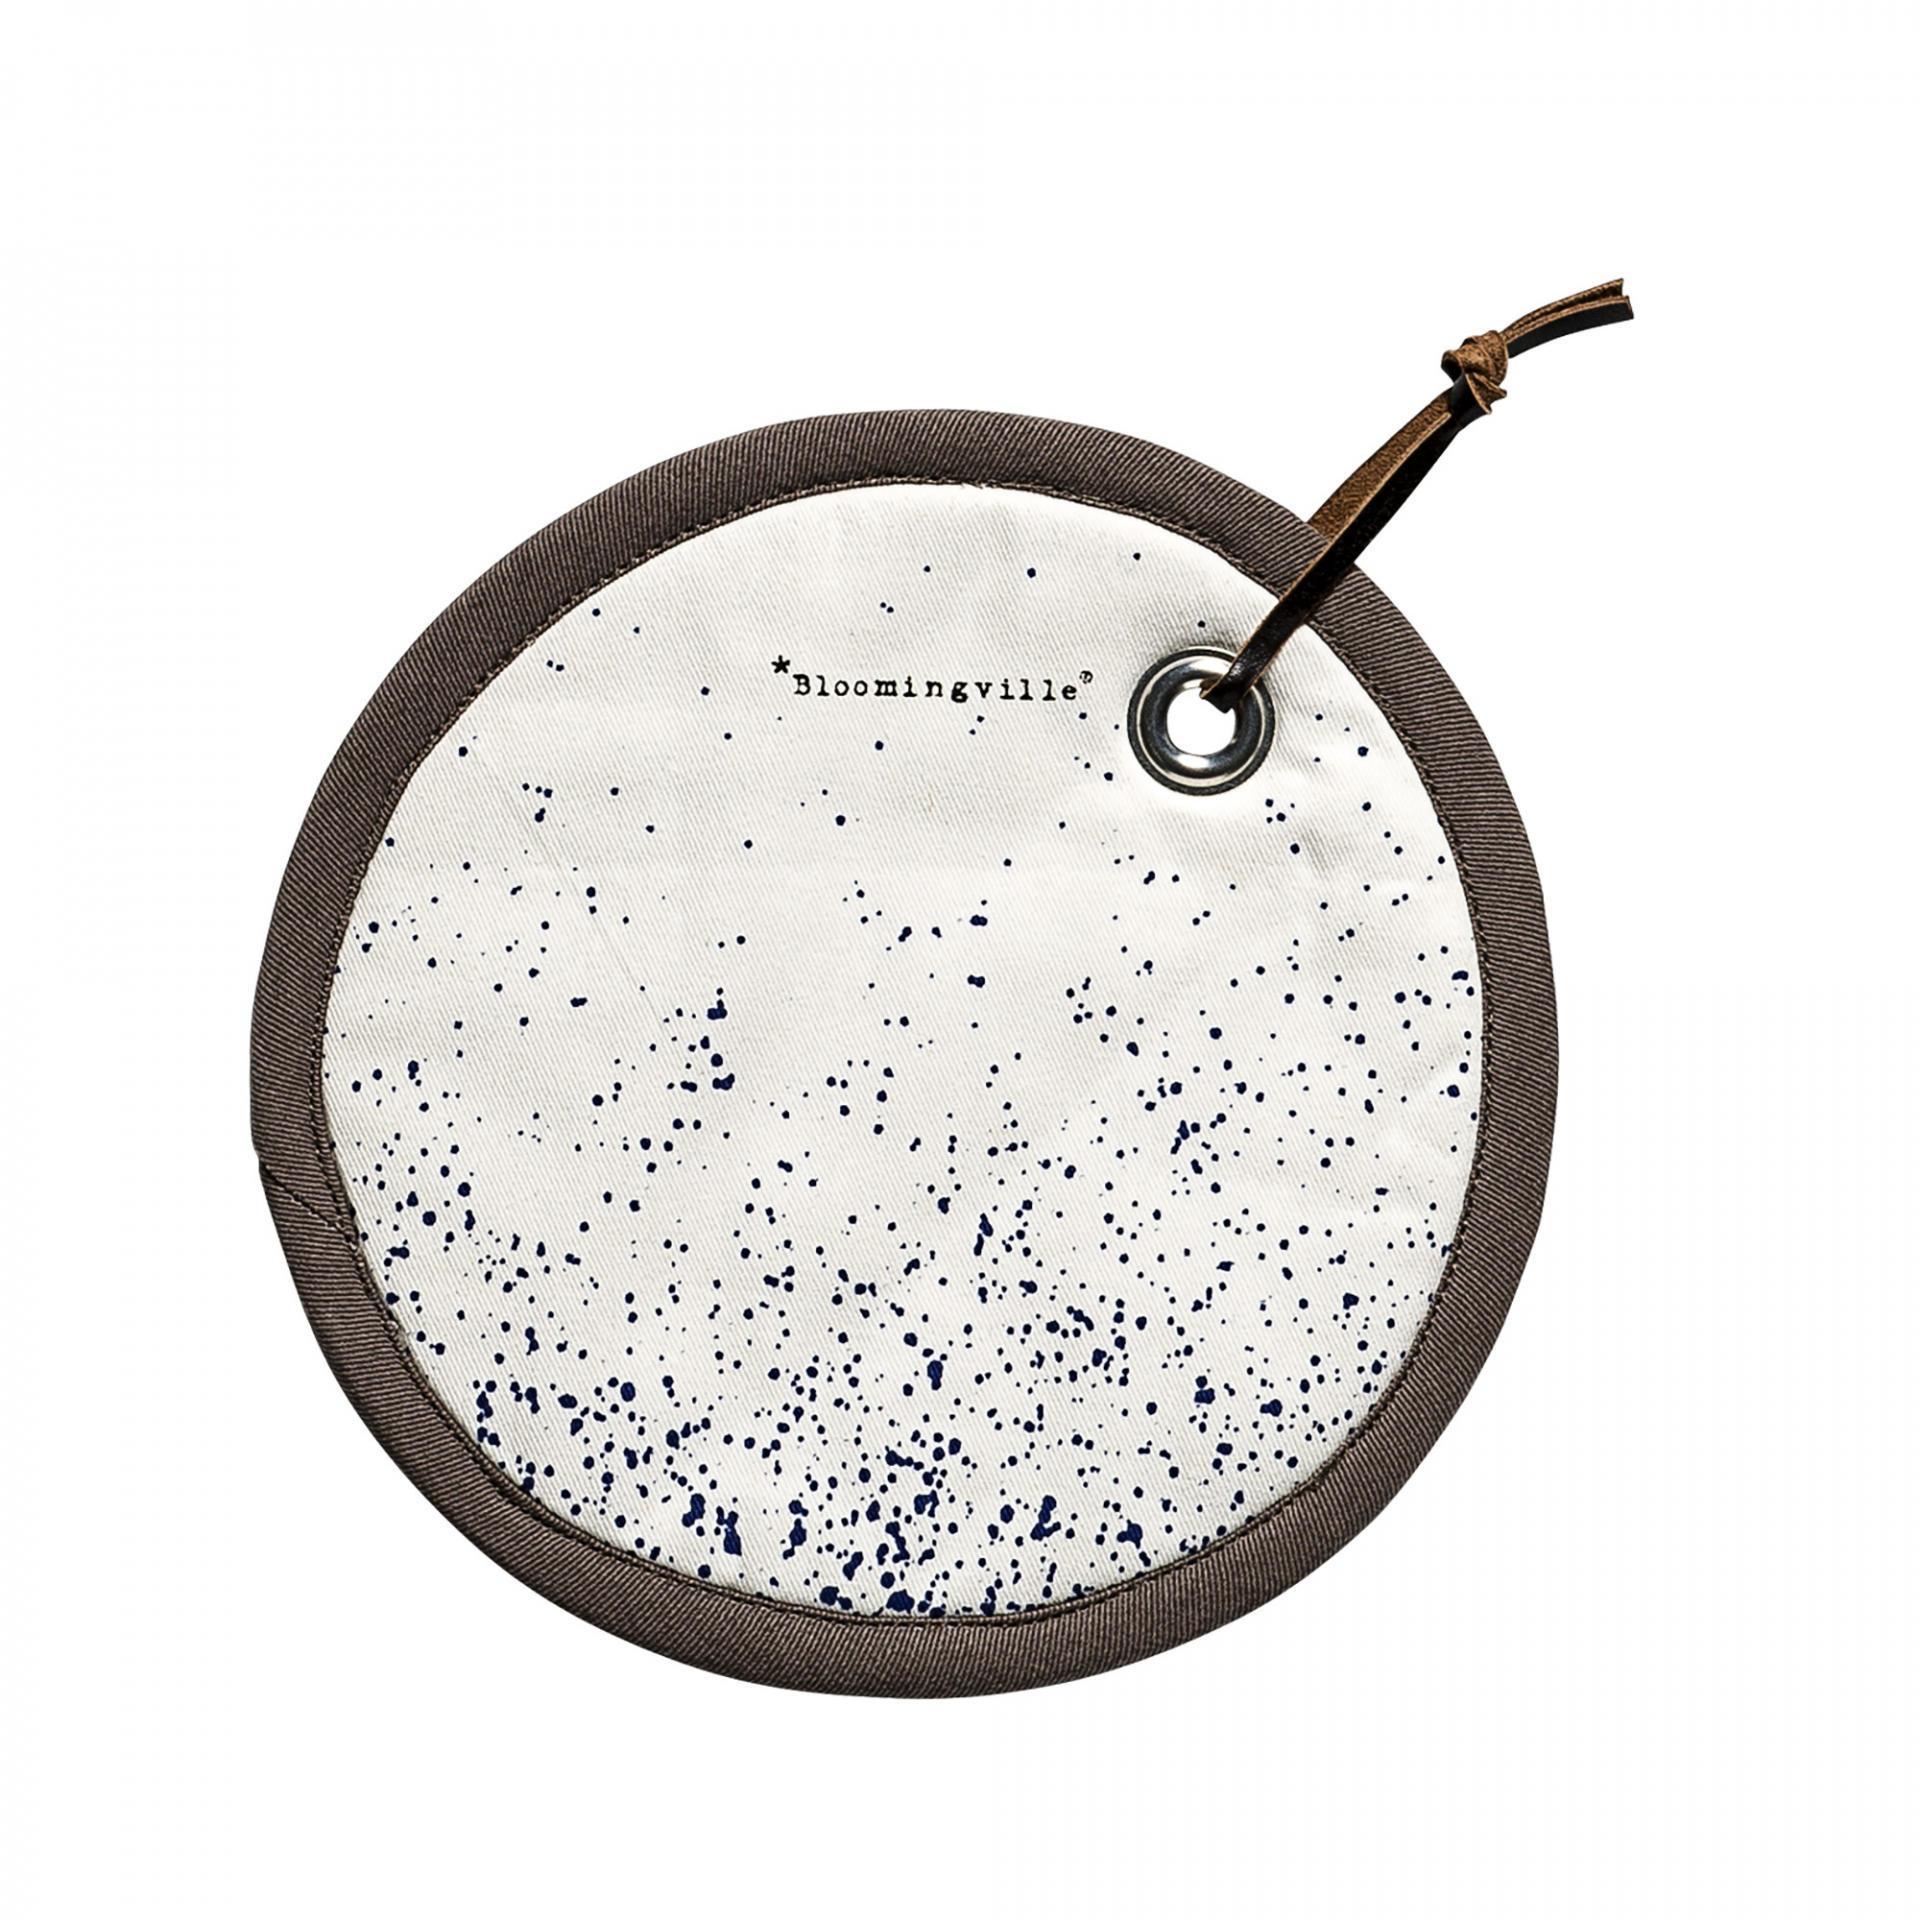 Bloomingville Podložka pod hrnec White/Royal Blue, multi barva, textil